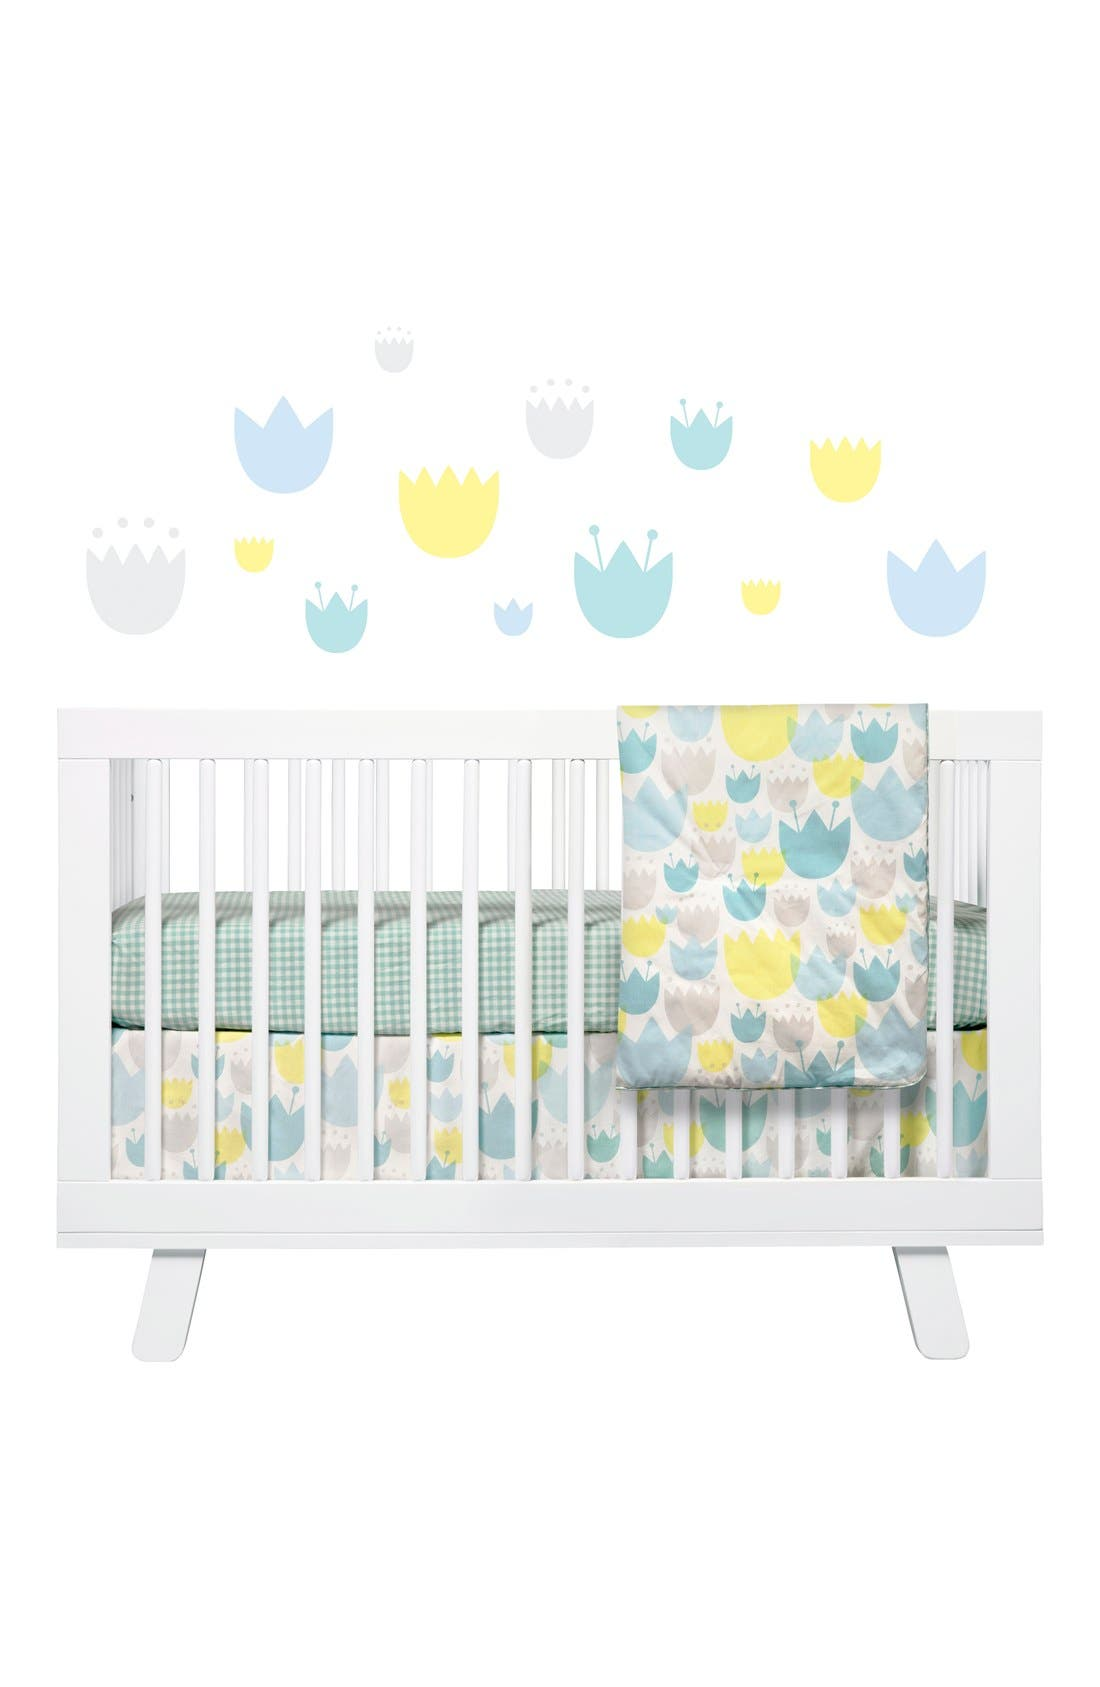 Main Image - babyletto 'Garden' Crib Sheet, Crib Skirt, Stroller Blanket & Wall Decals